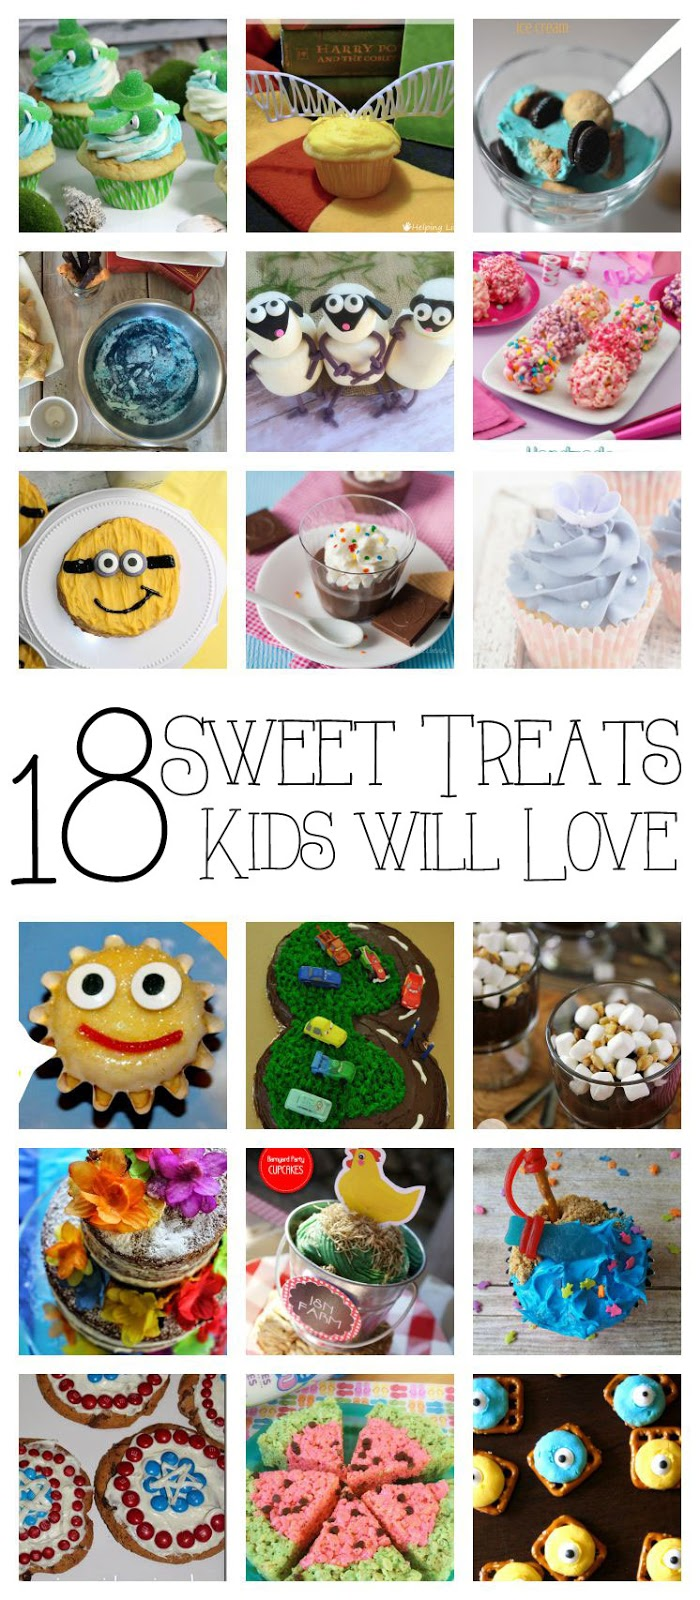 18 Desserts for Kids